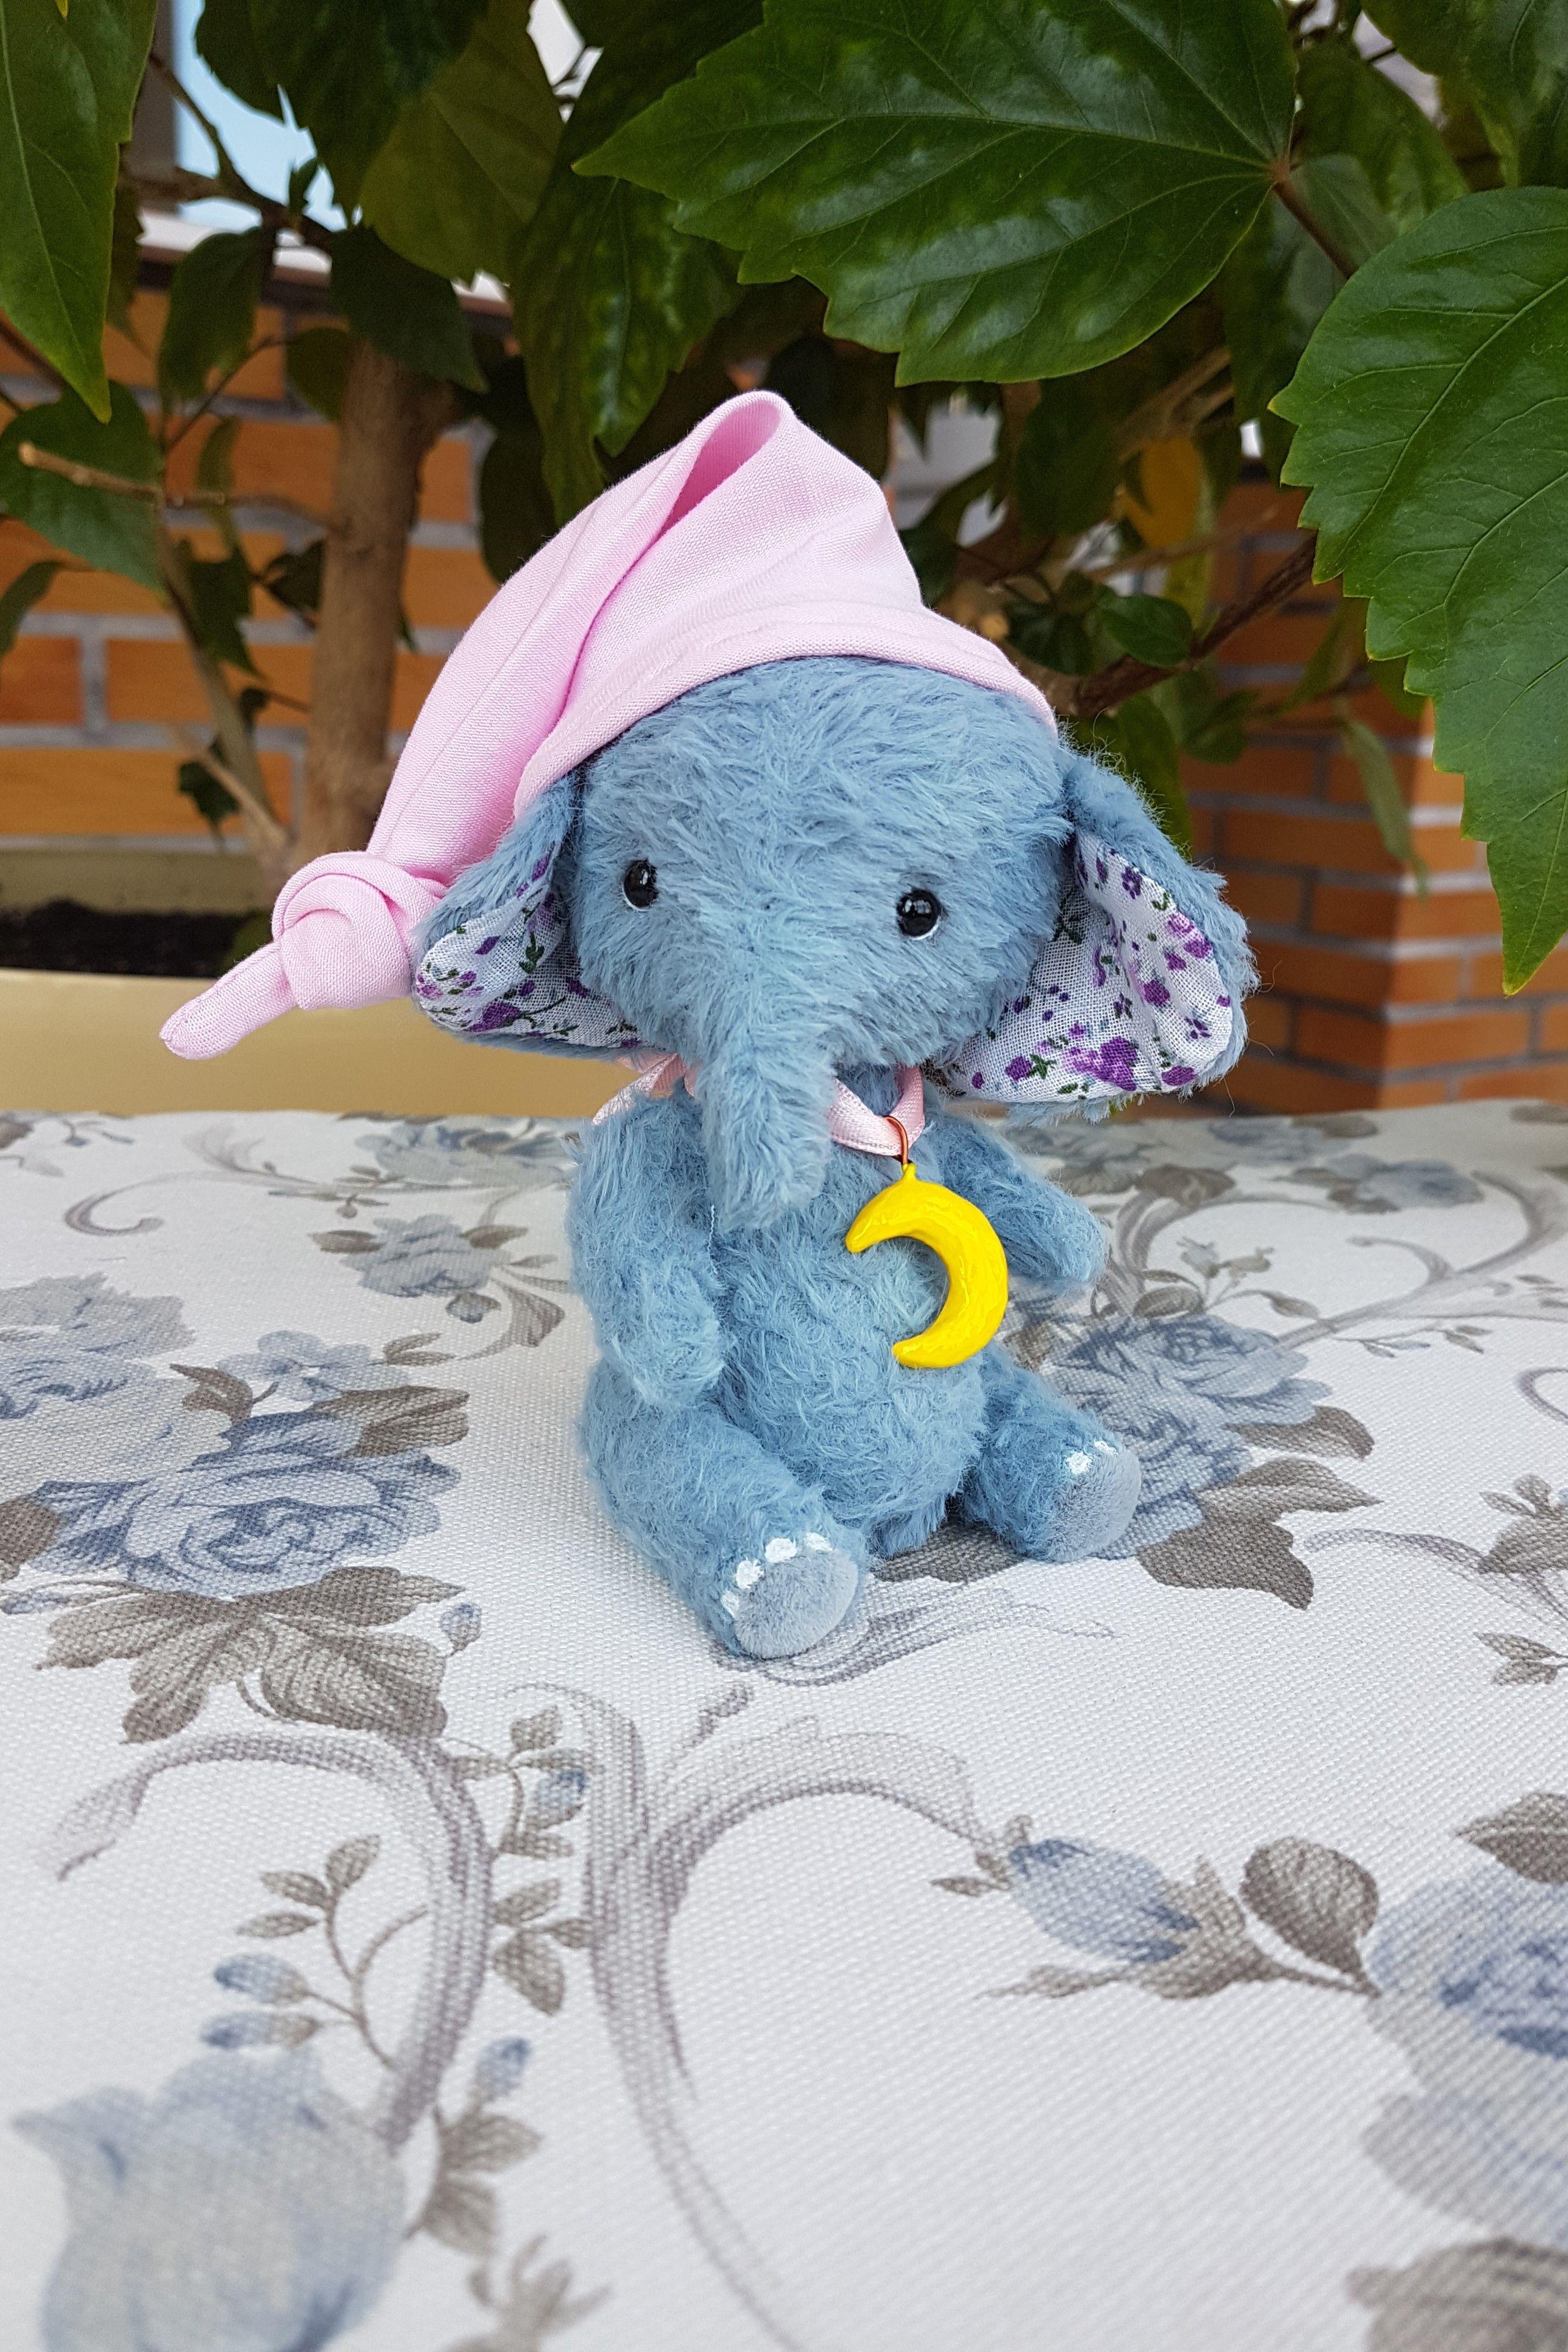 Elephant Mr Splushkin By Diana Verevkina